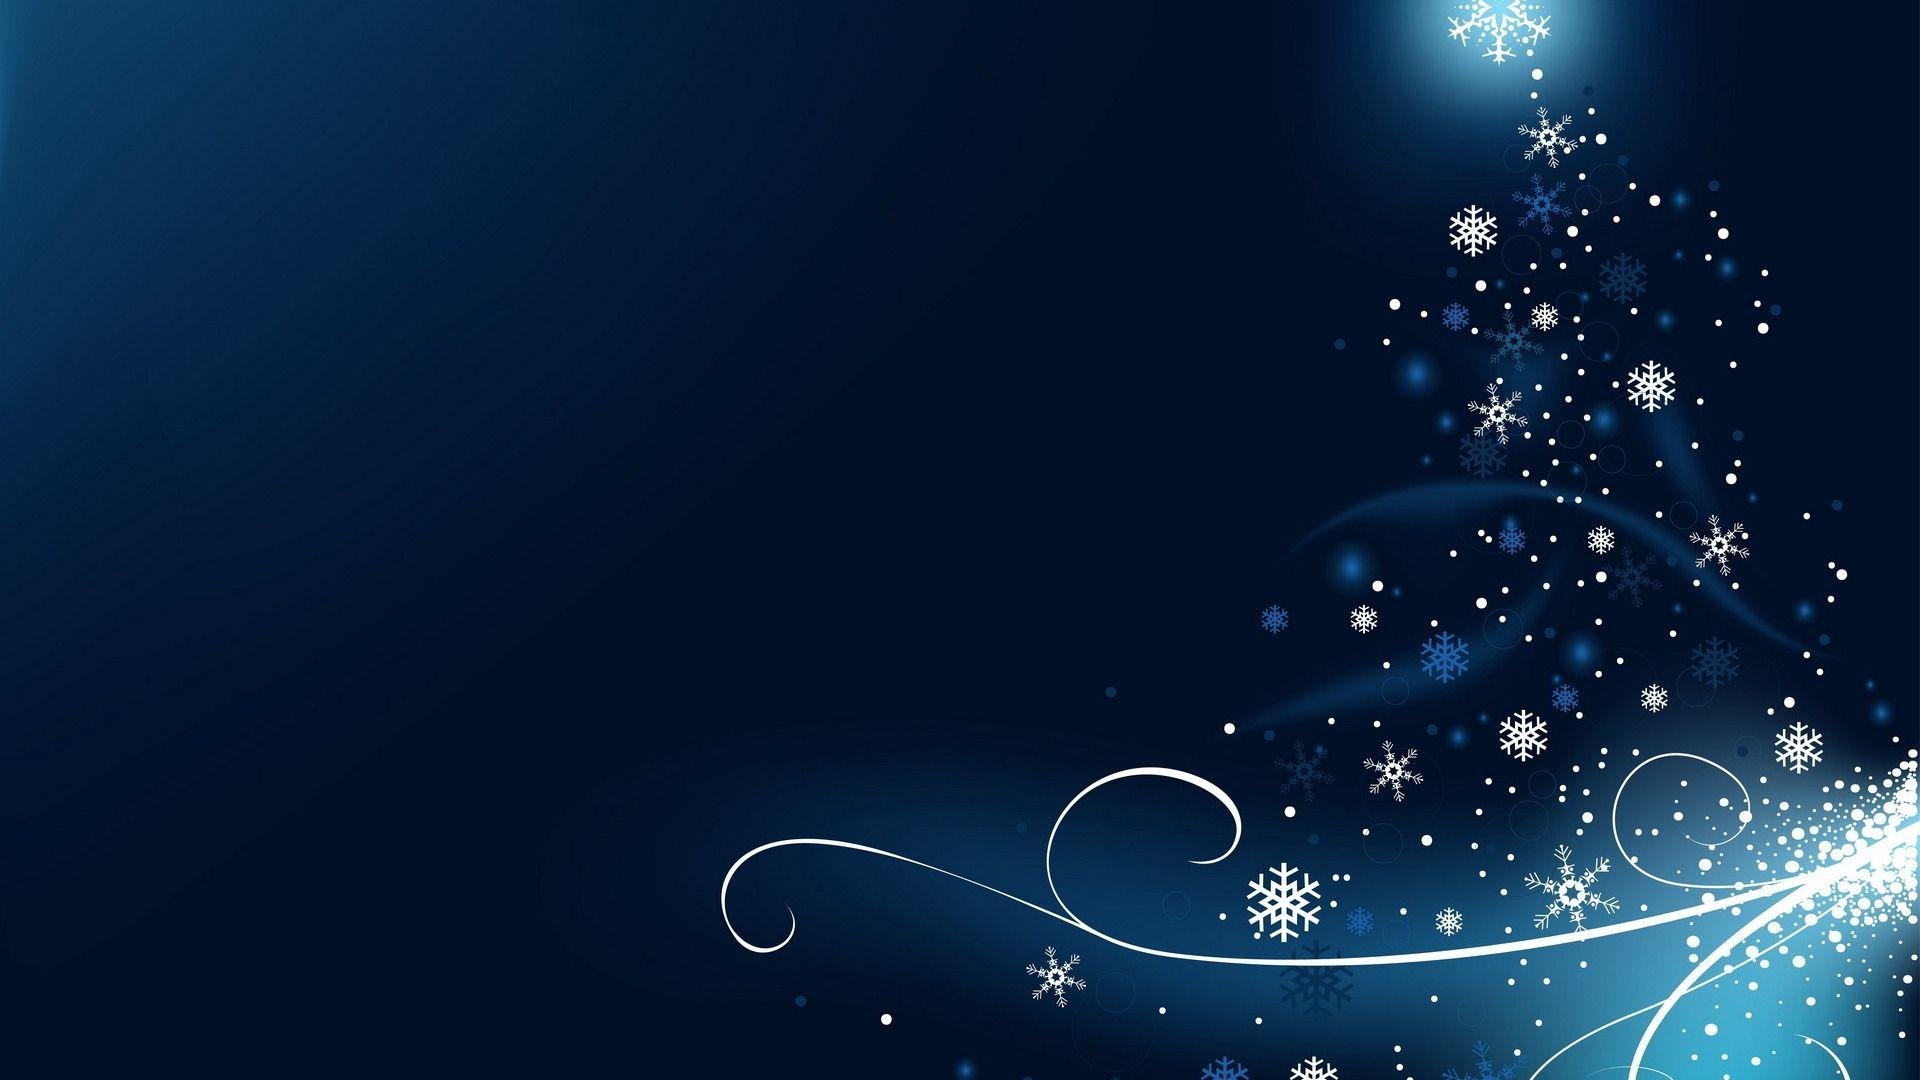 1920x1080 snowflakes desktop pc and mac wallpaper | christmas